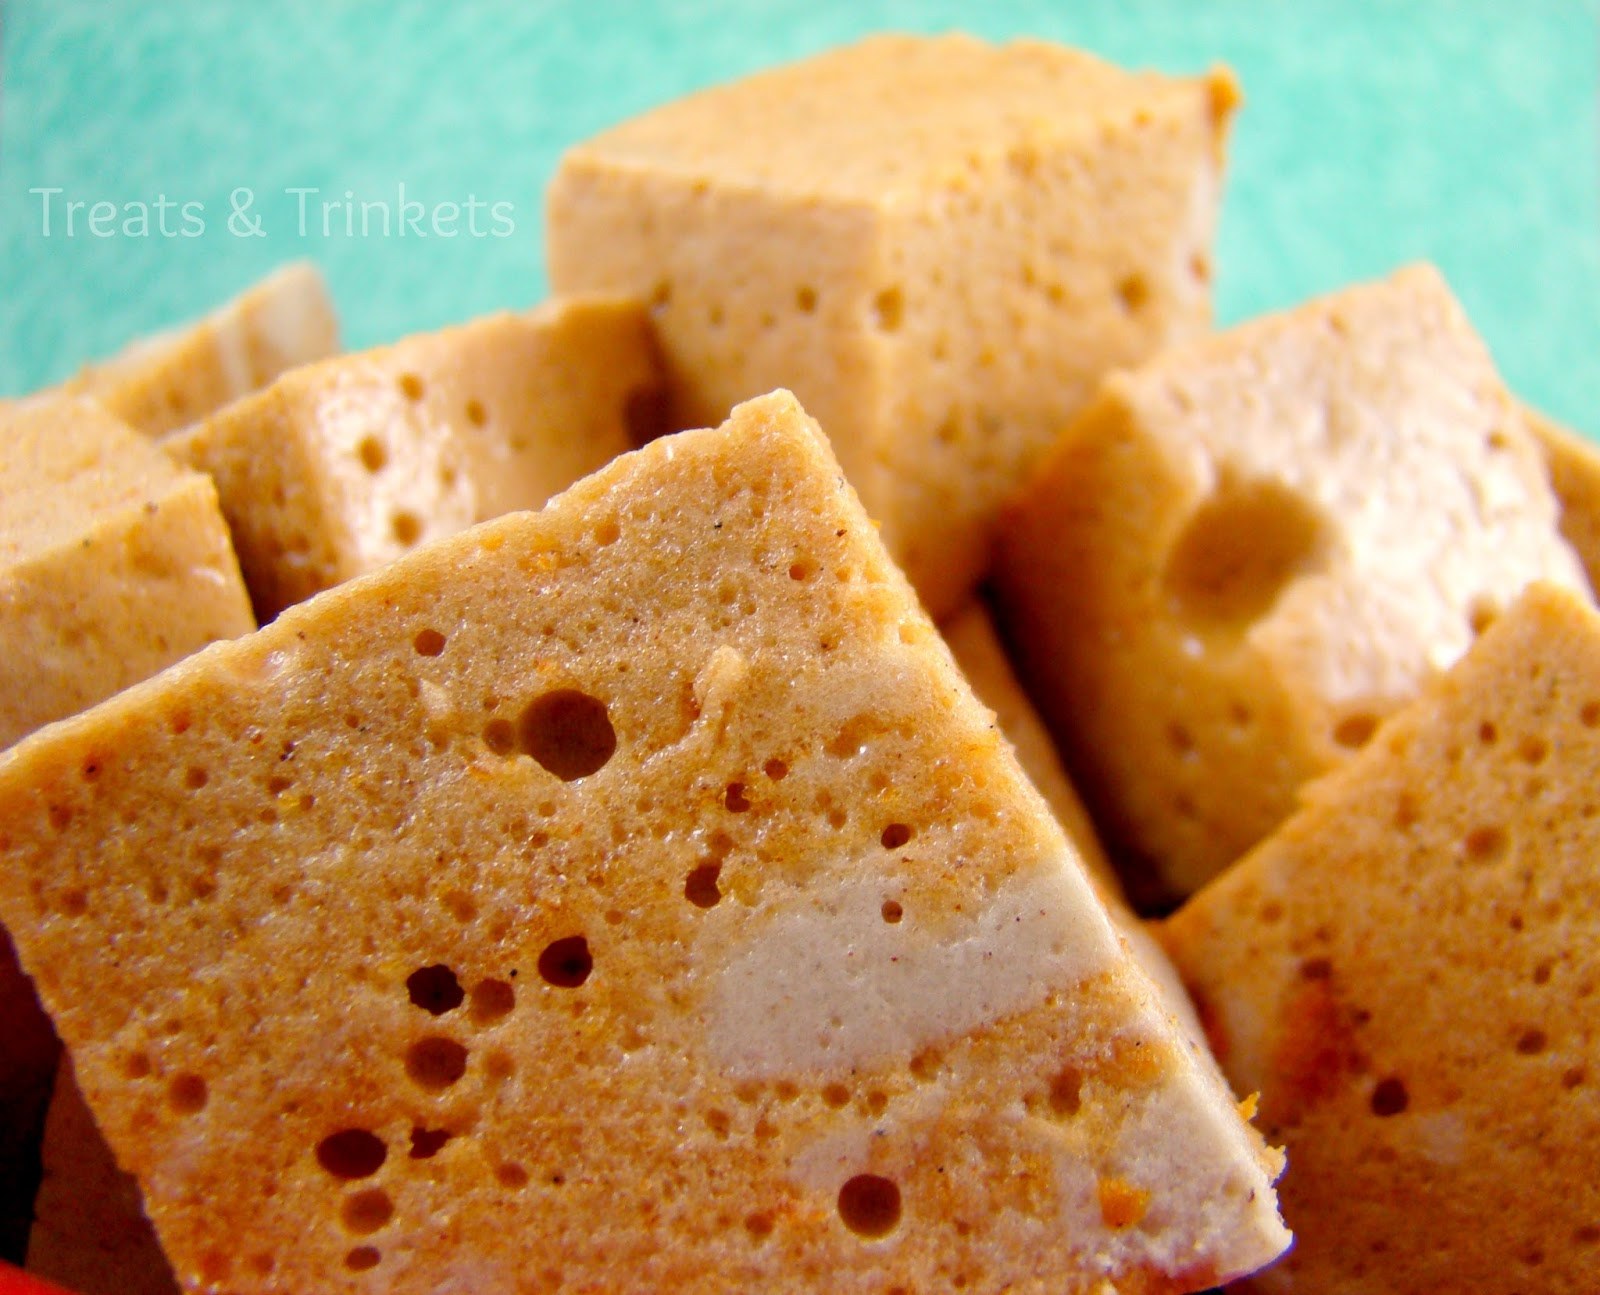 Treats & Trinkets: Pumpkin Spice Marshmallows